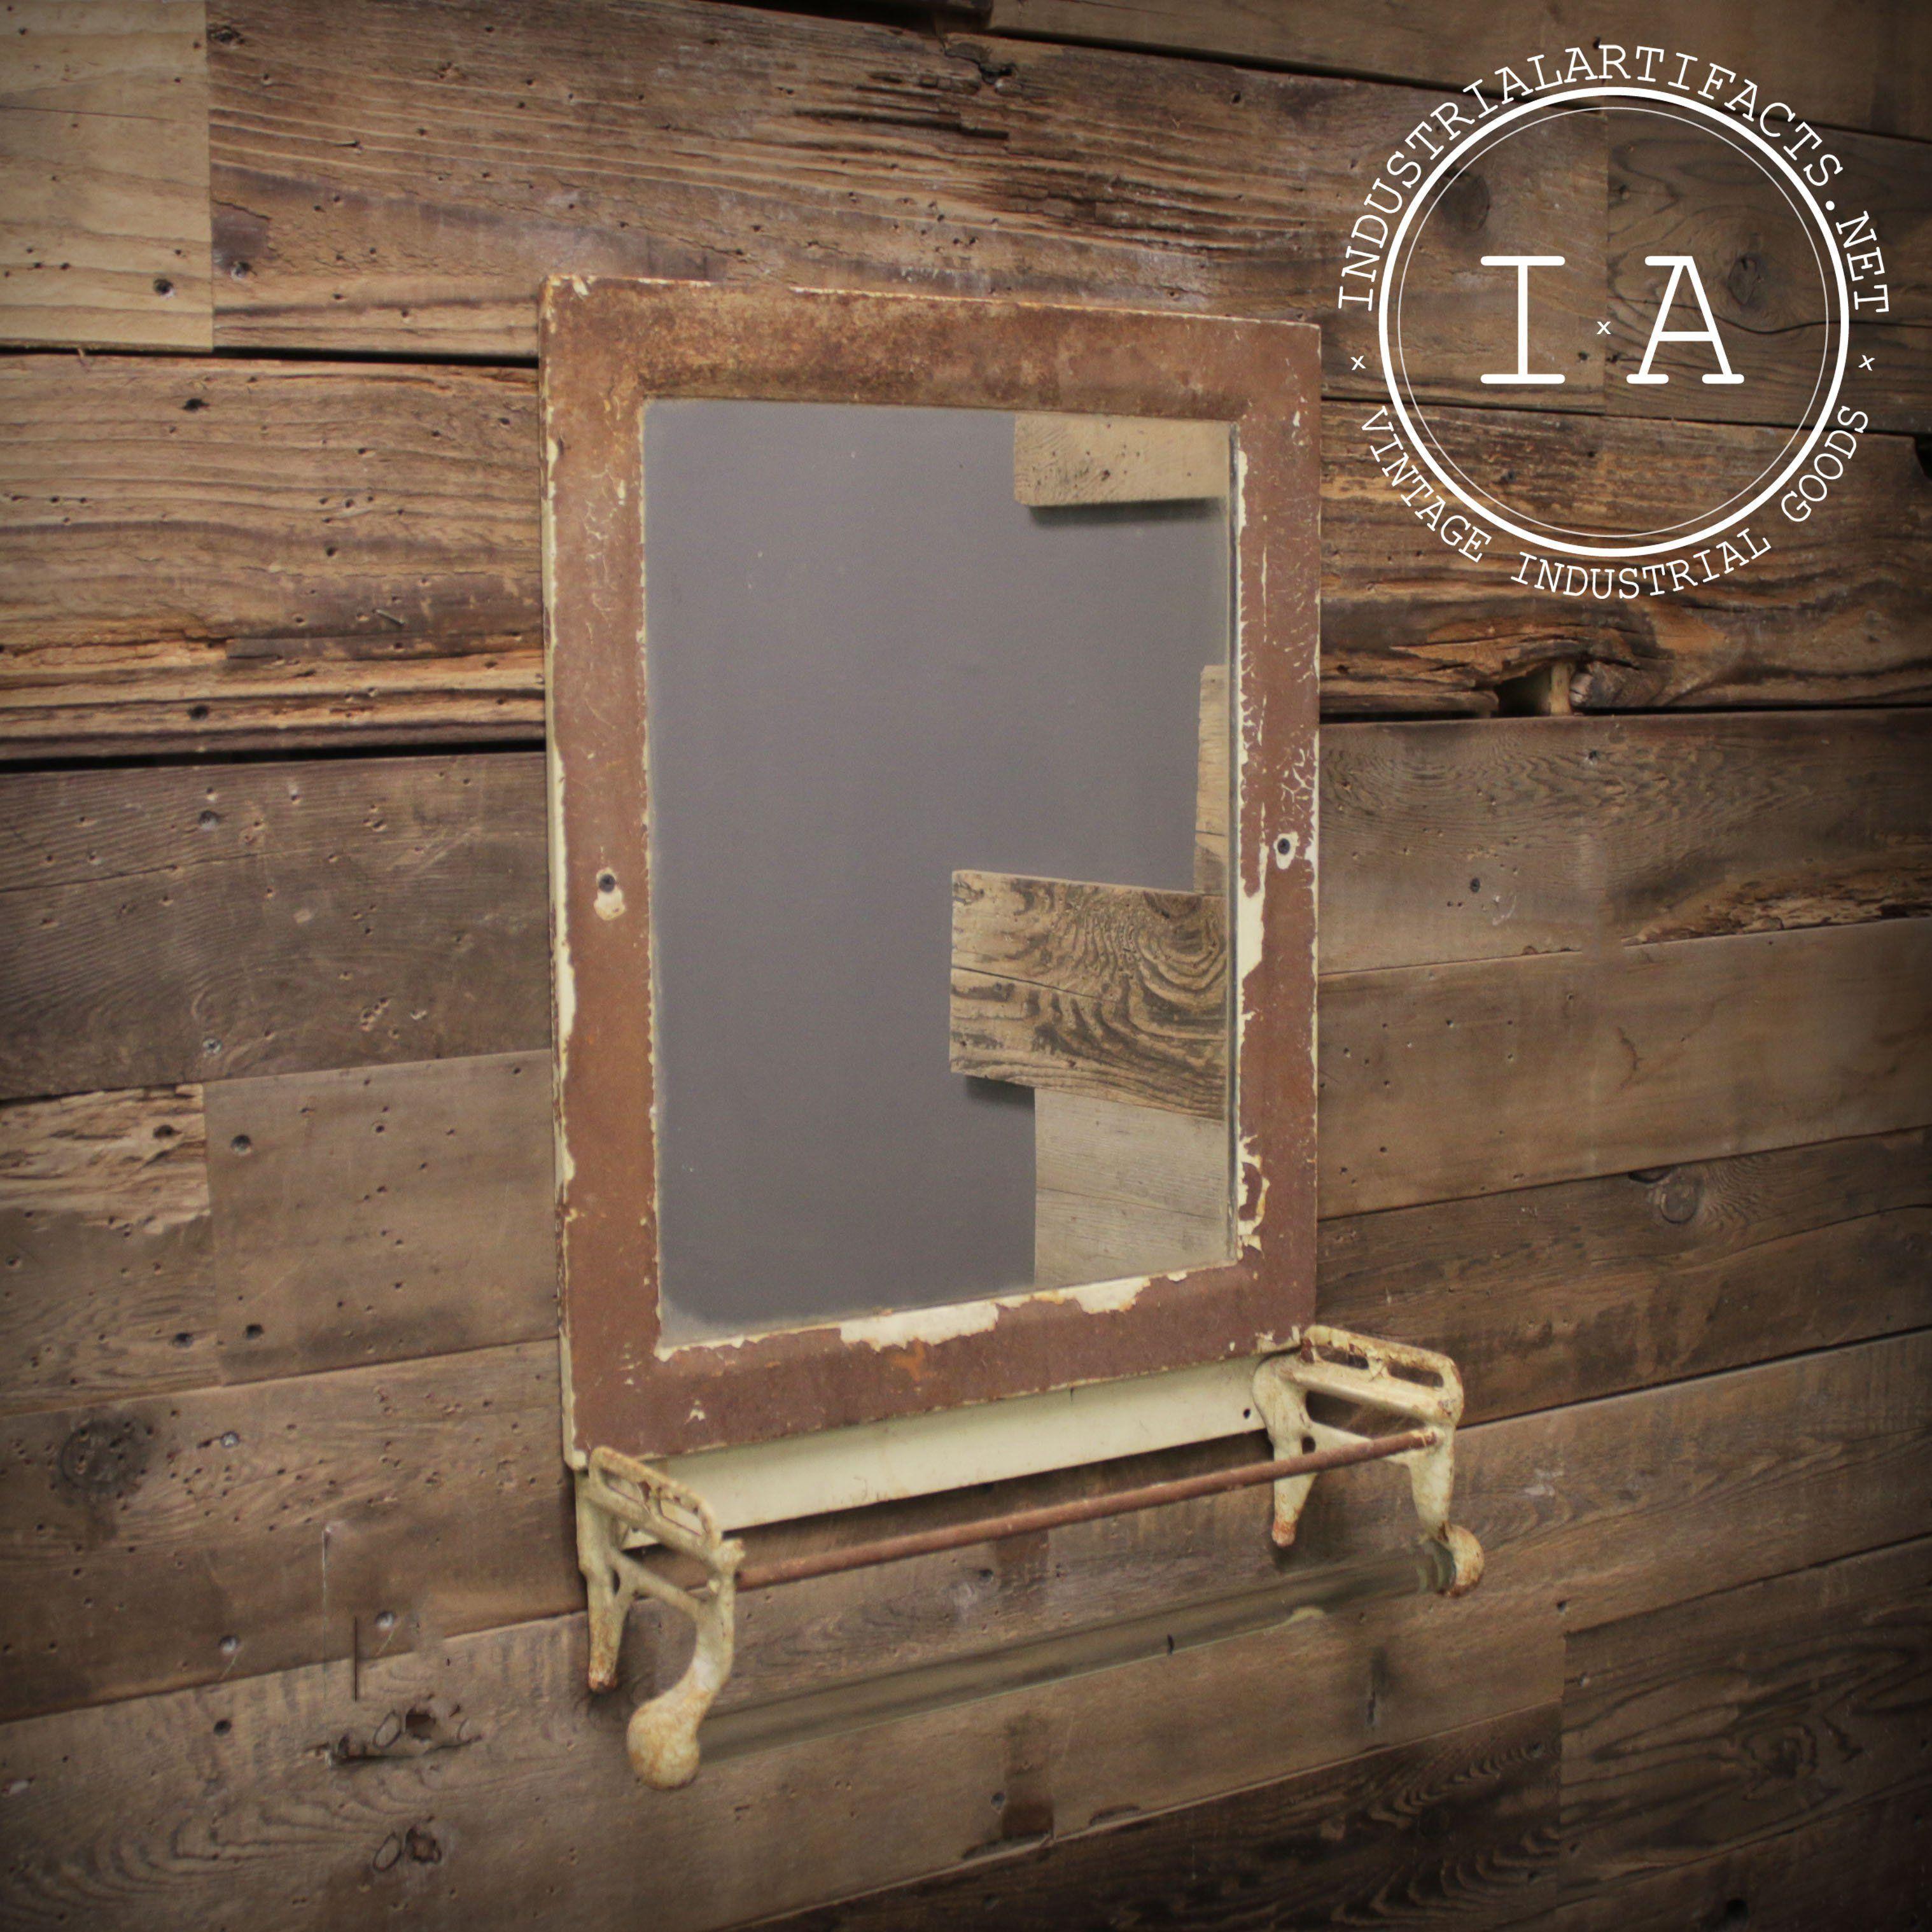 Vintage Shabby Chic Bathroom Vanity Mirror with Towel Rod  #shabbychicbathroomsvanity